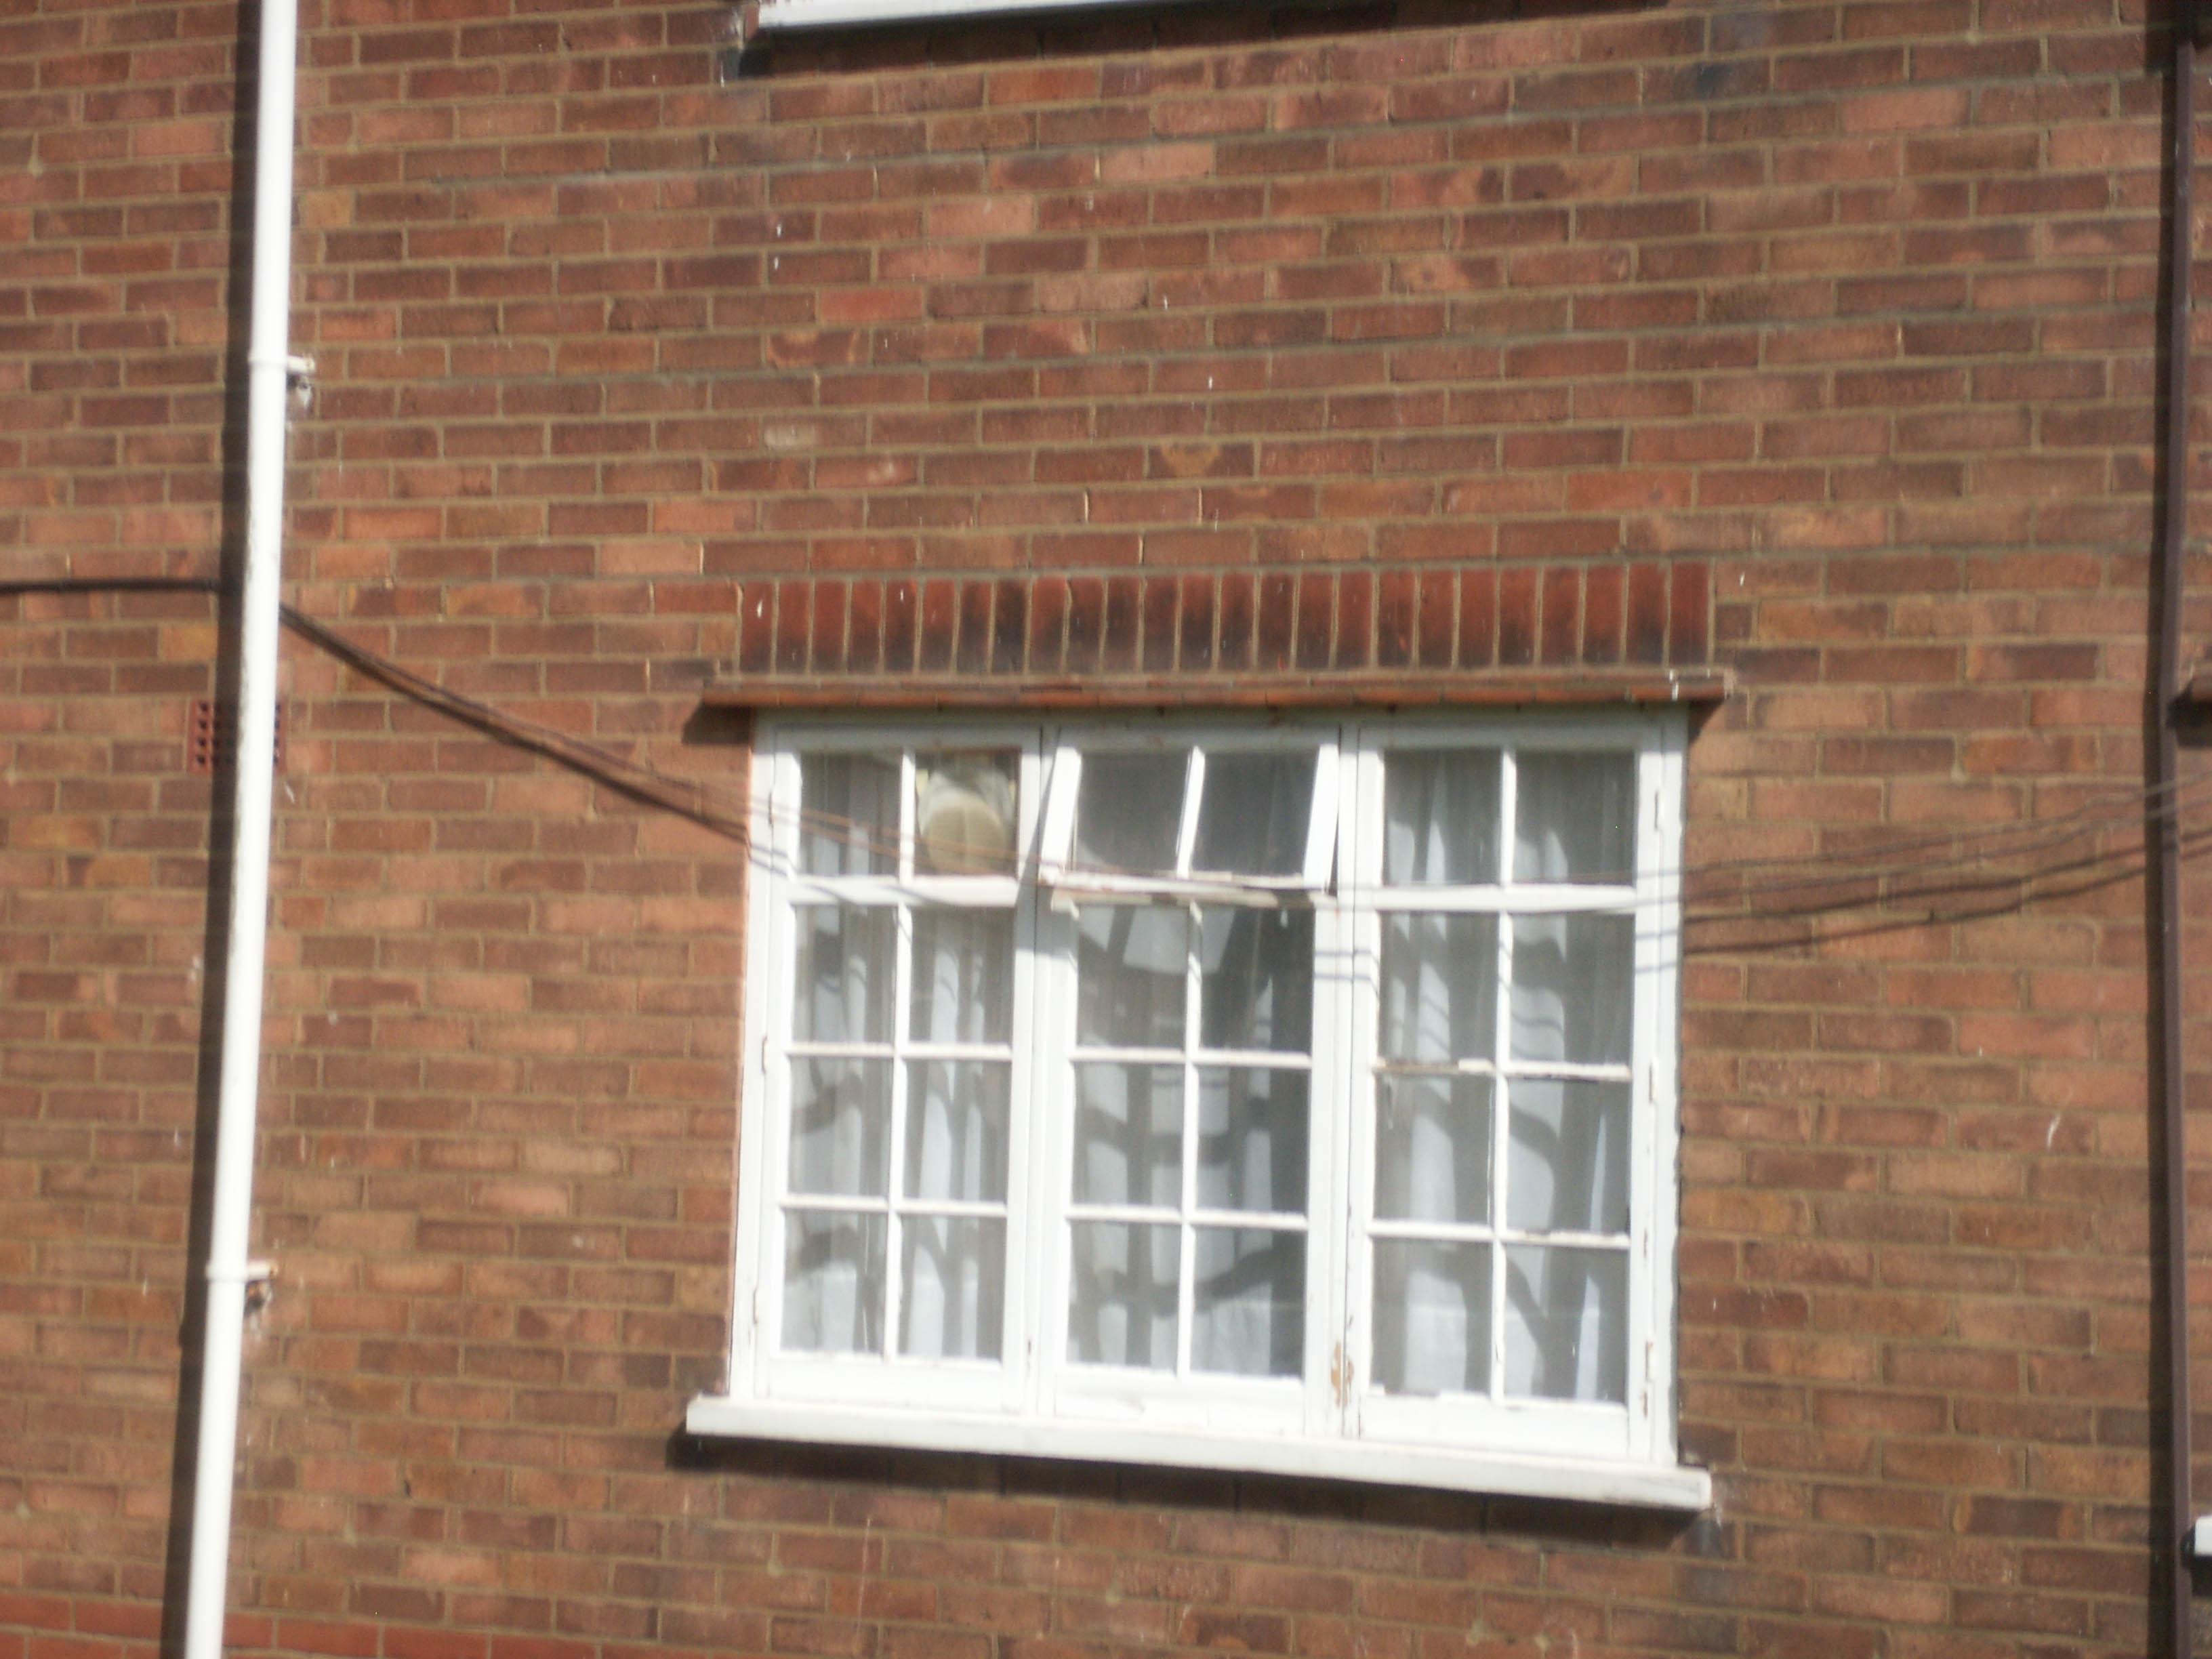 Lintel Reinforcement For Council Home Upvc Window Upgrade